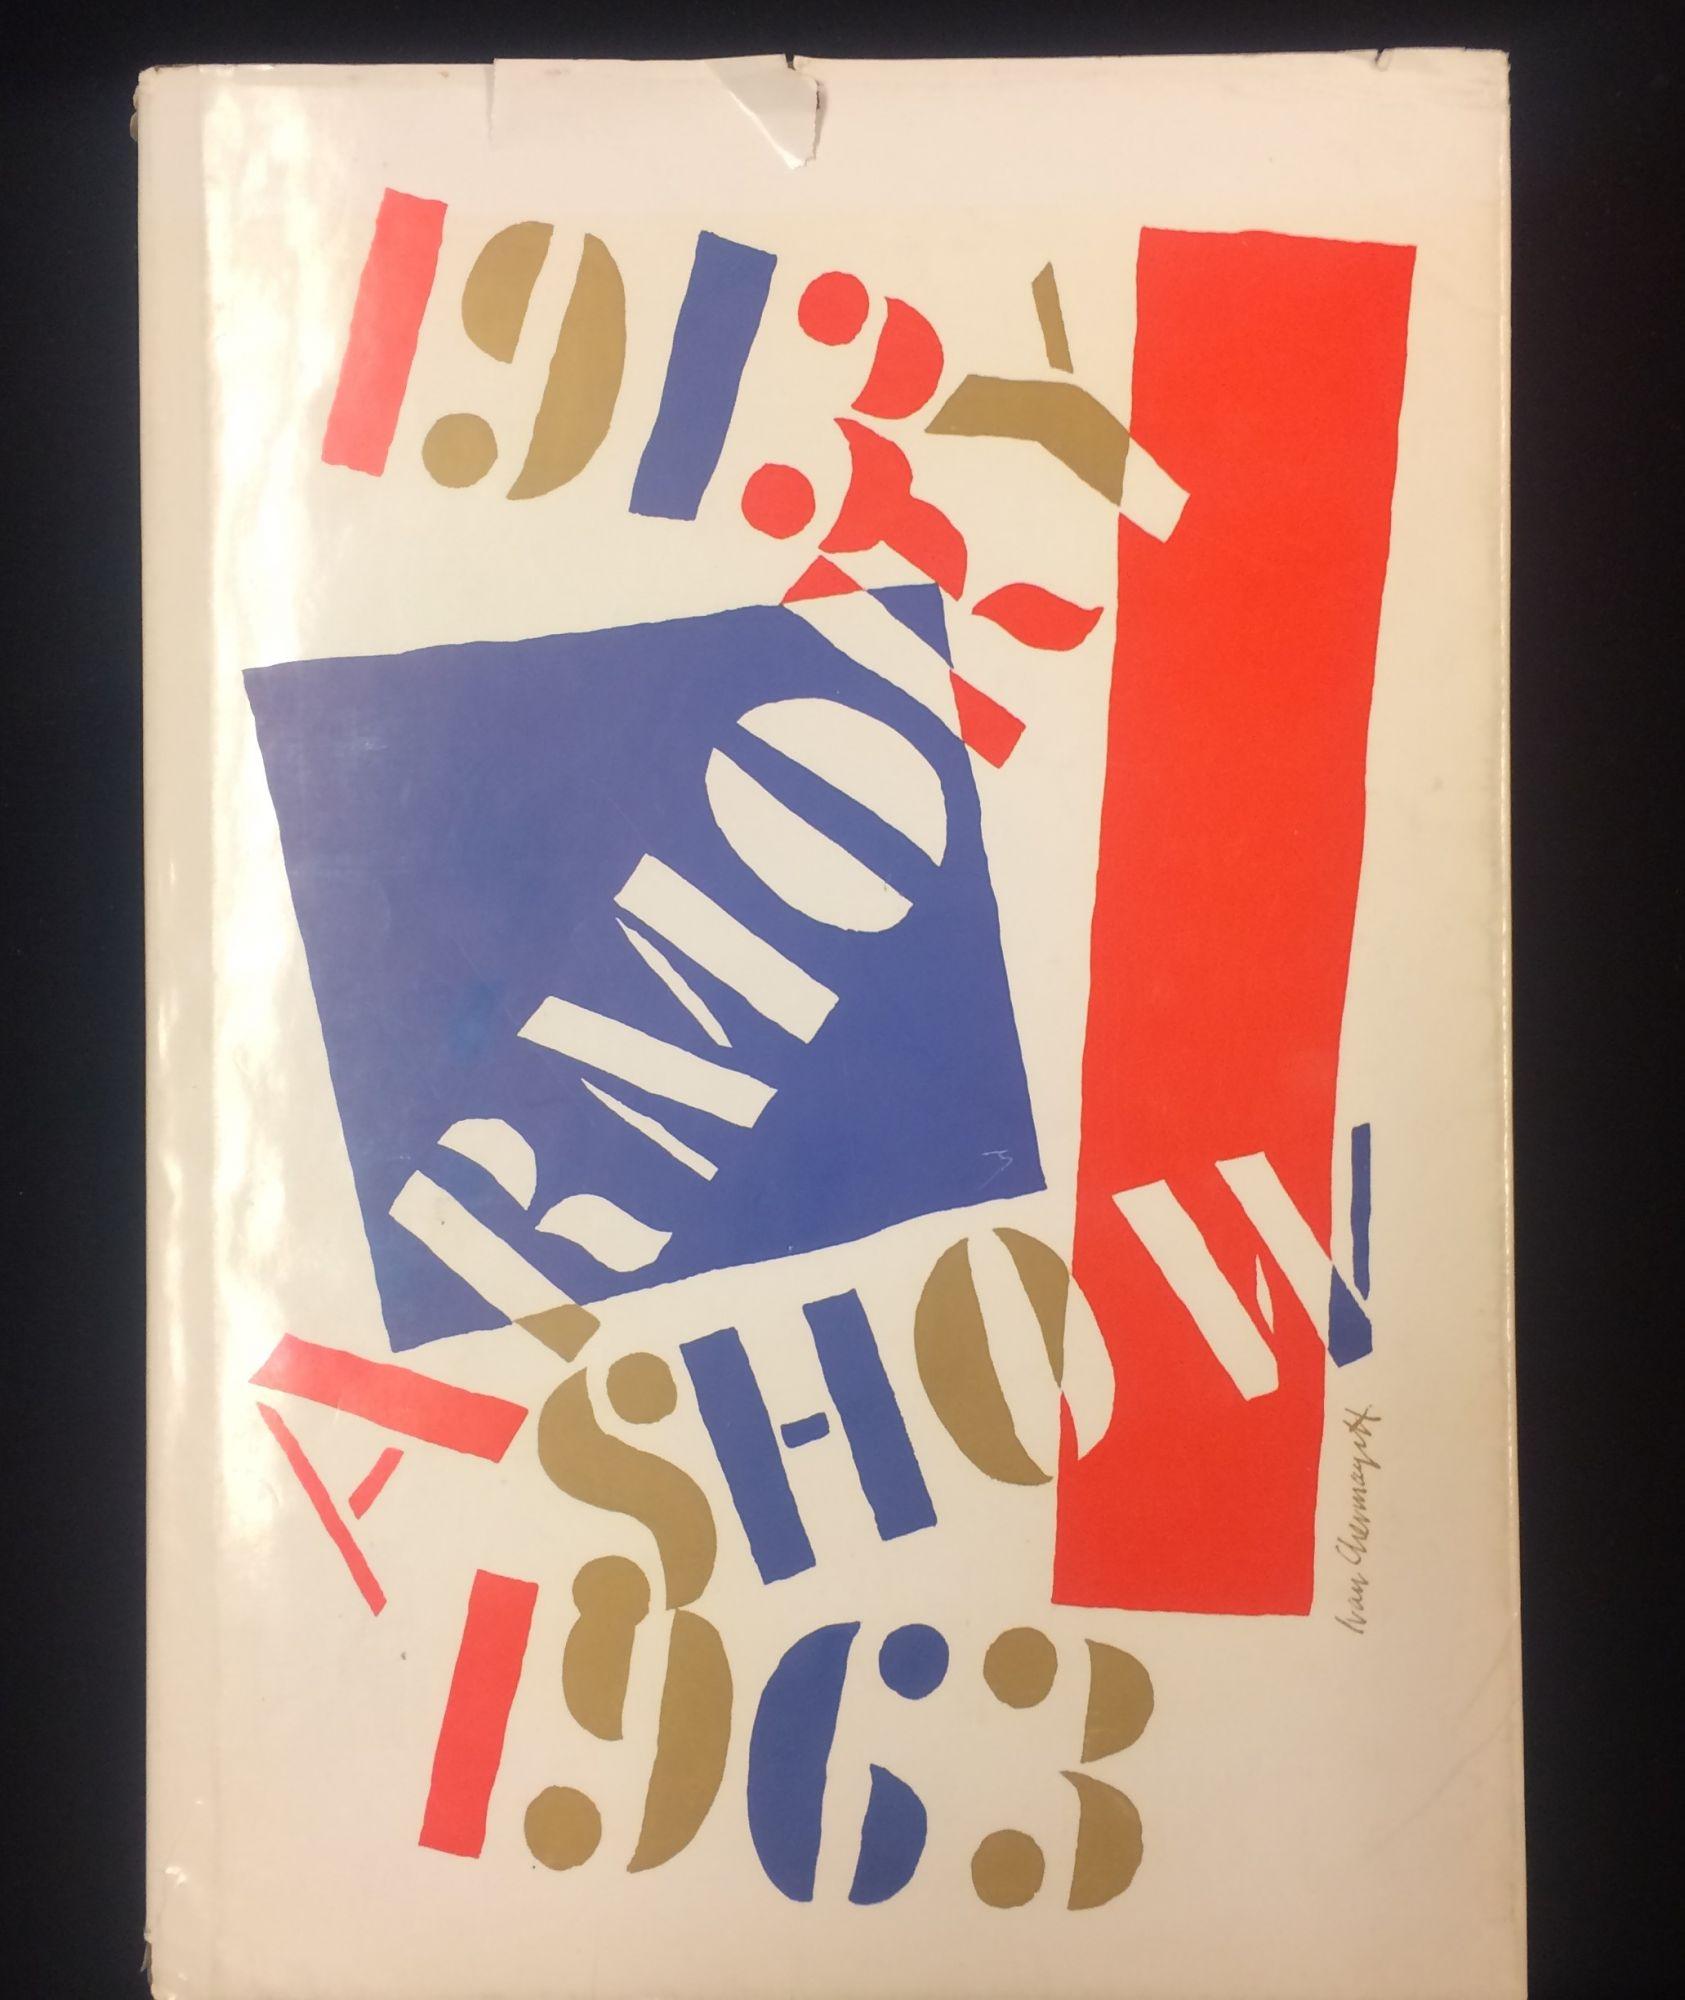 1913 Armory Show 50th Anniversary Exhibition 1963.: Chermayeff, Ivan (dustjacket